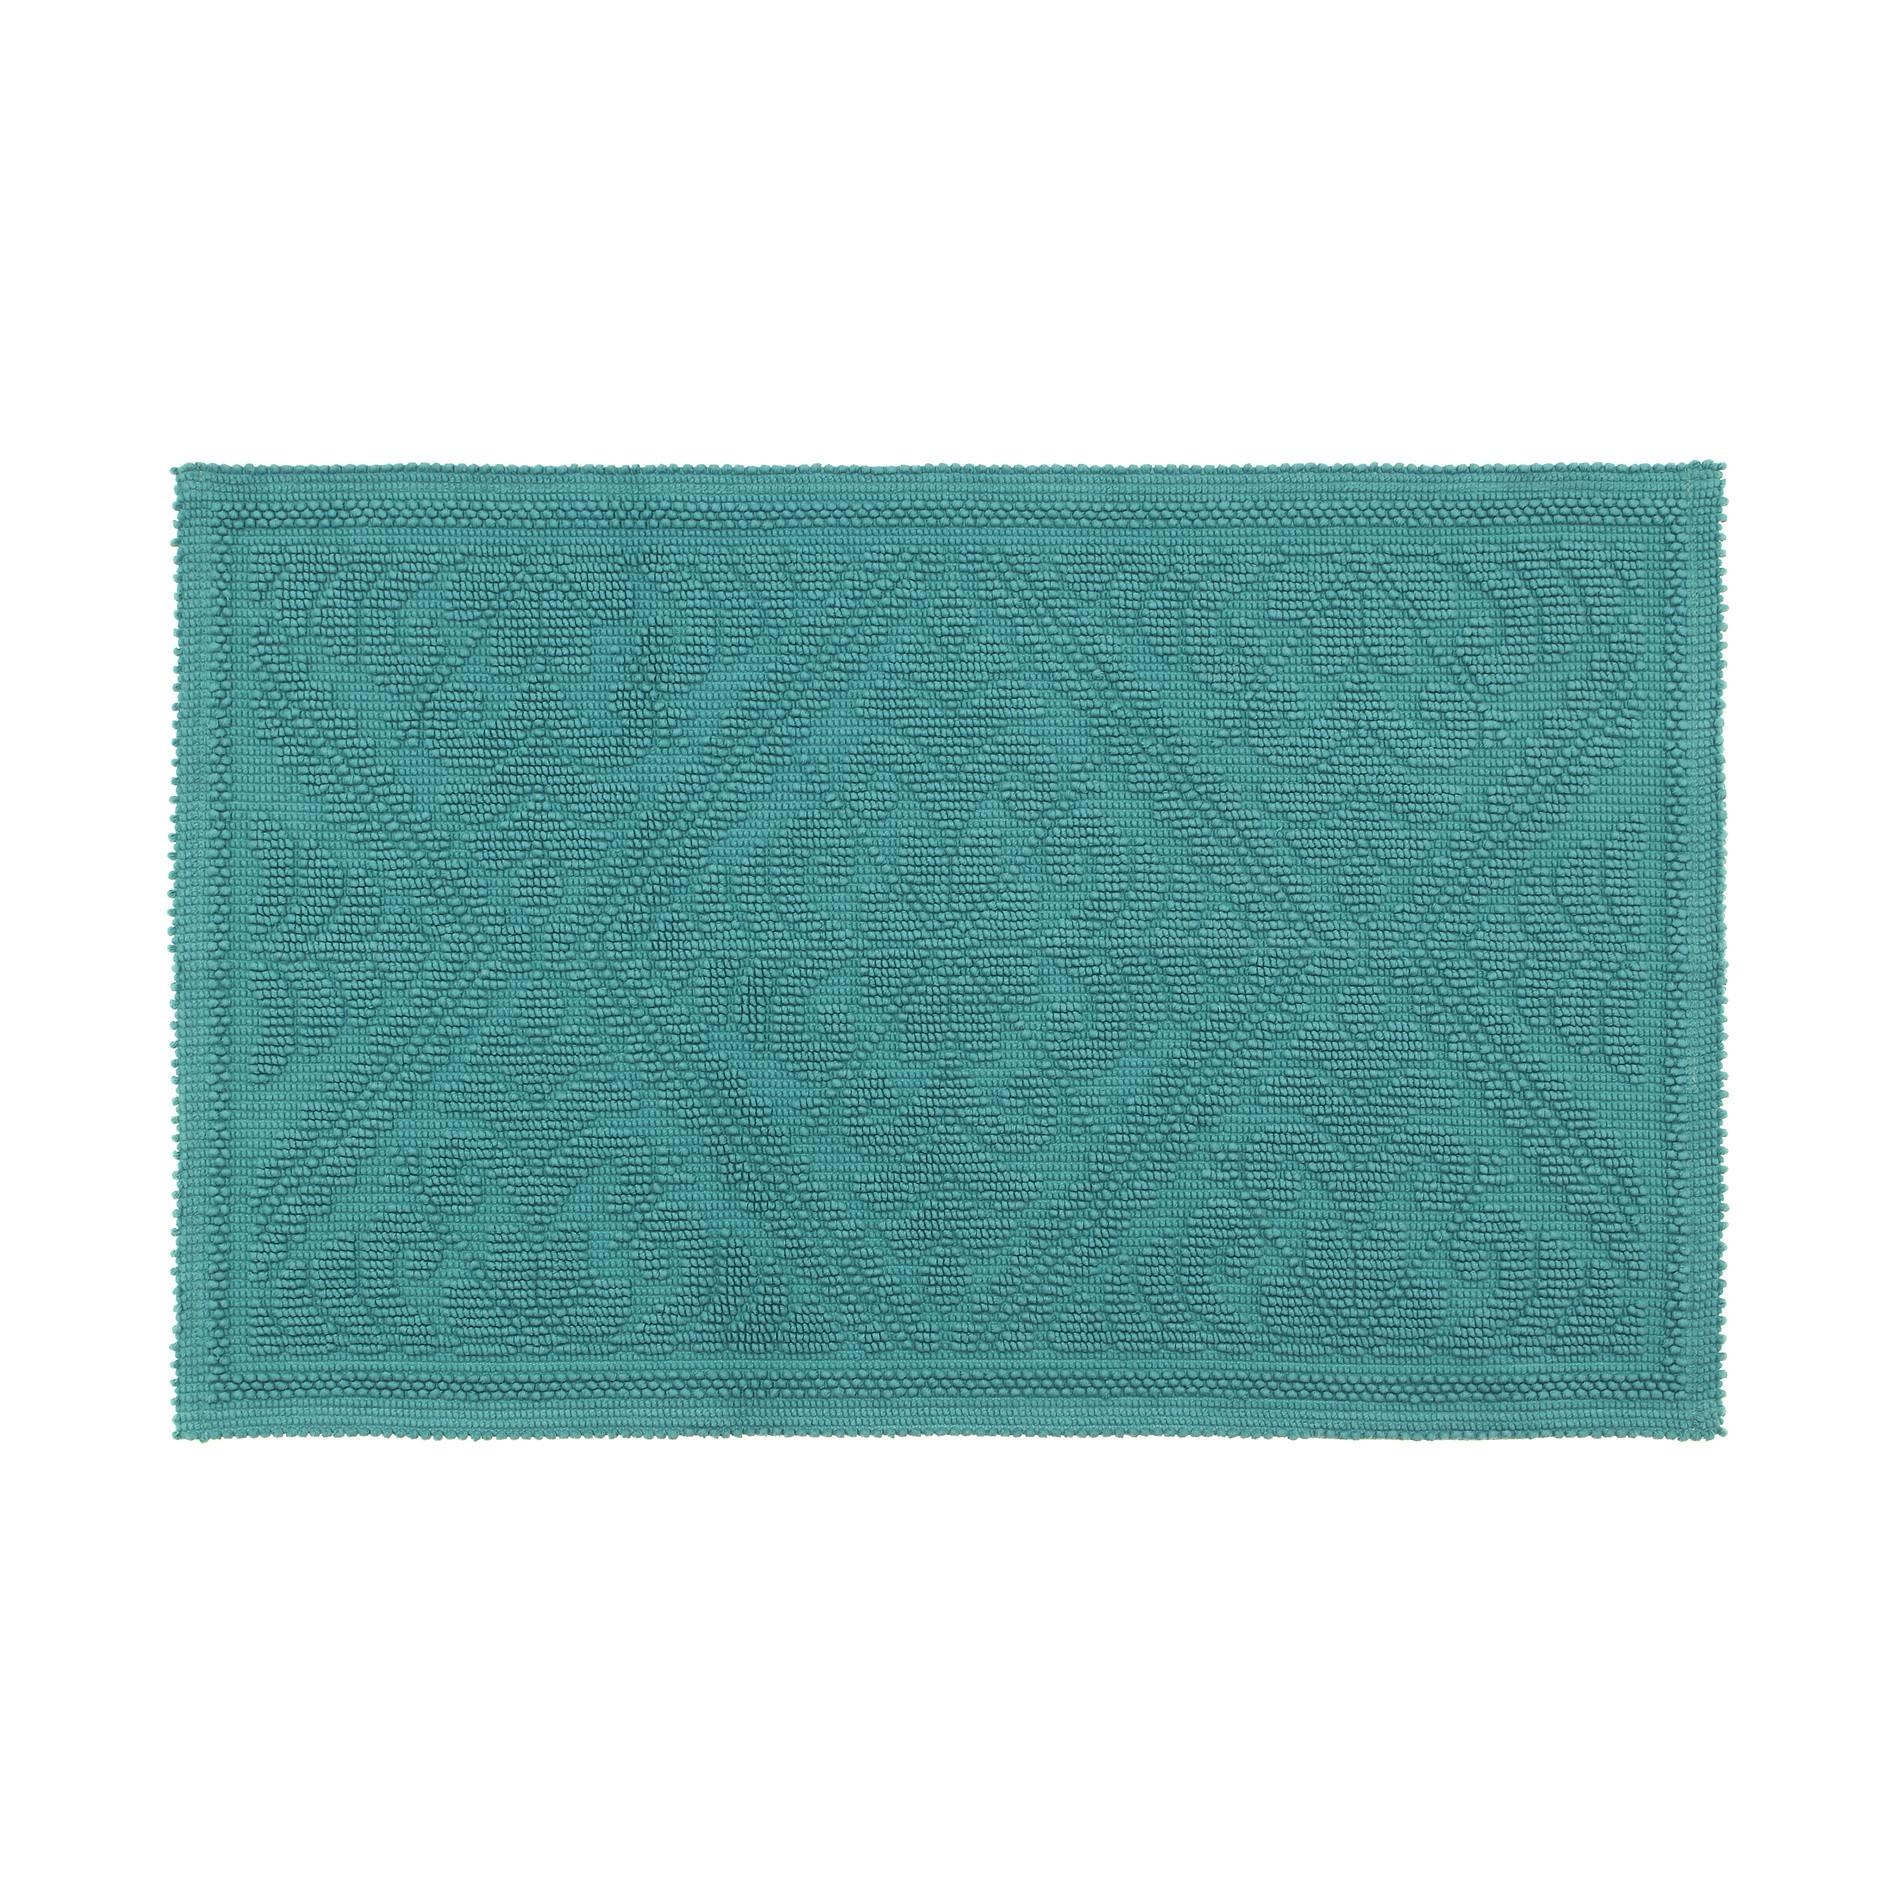 Tappeto scendidoccia spugna jacquard Zefiro, Verde smeraldo, large image number 0